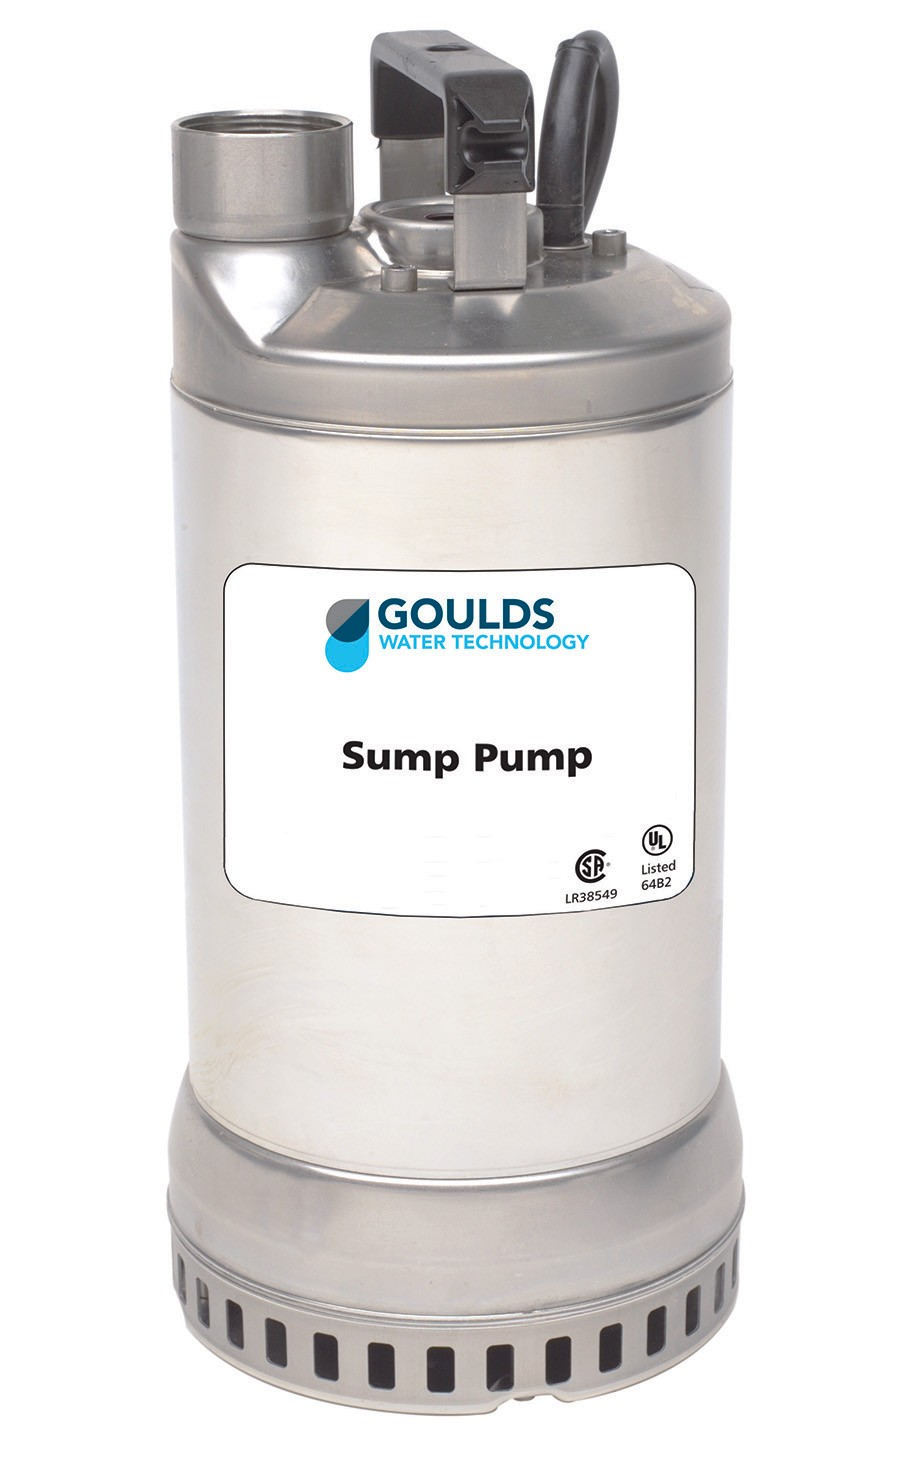 Sump Pump Goulds Circuitnet Wpcontent Uploads 2010 10 Variabledcpowersupply Photos